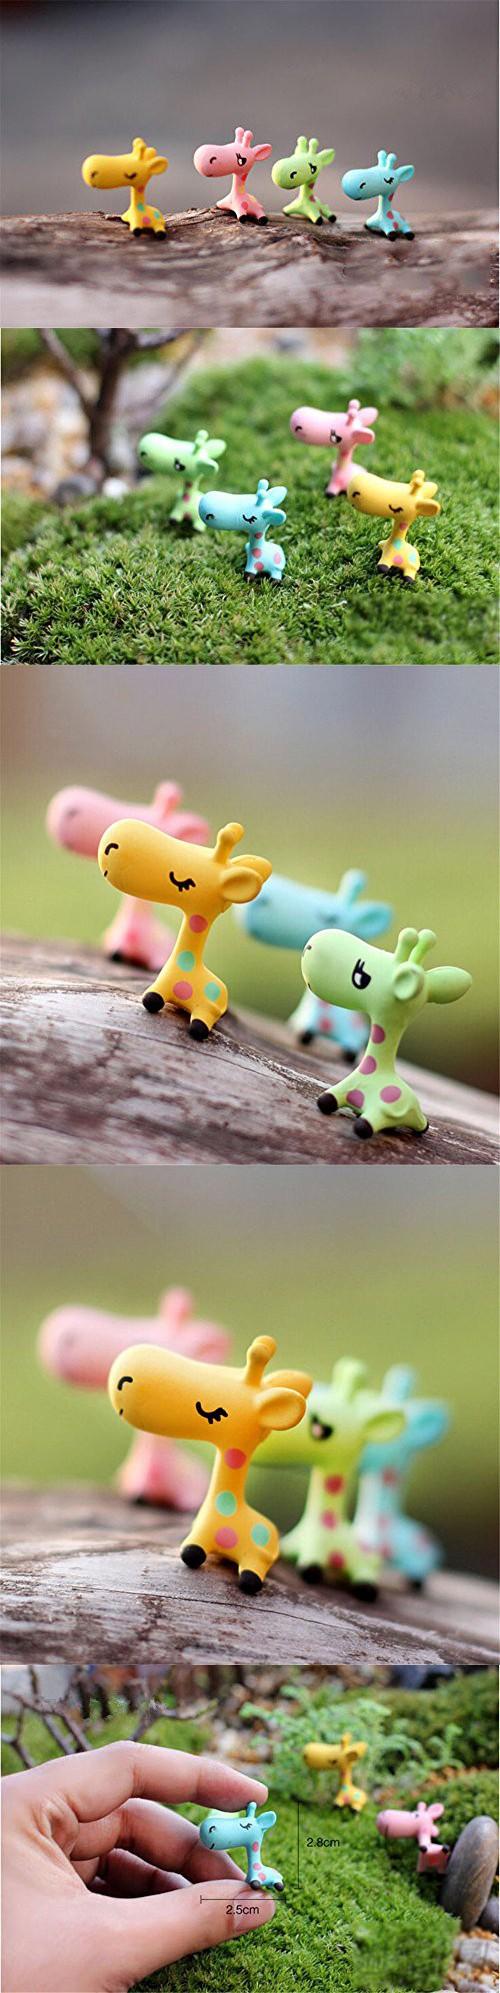 Danmu 4pcs Mini Resin Giraffes Miniature House Fairy Garden Micro ...